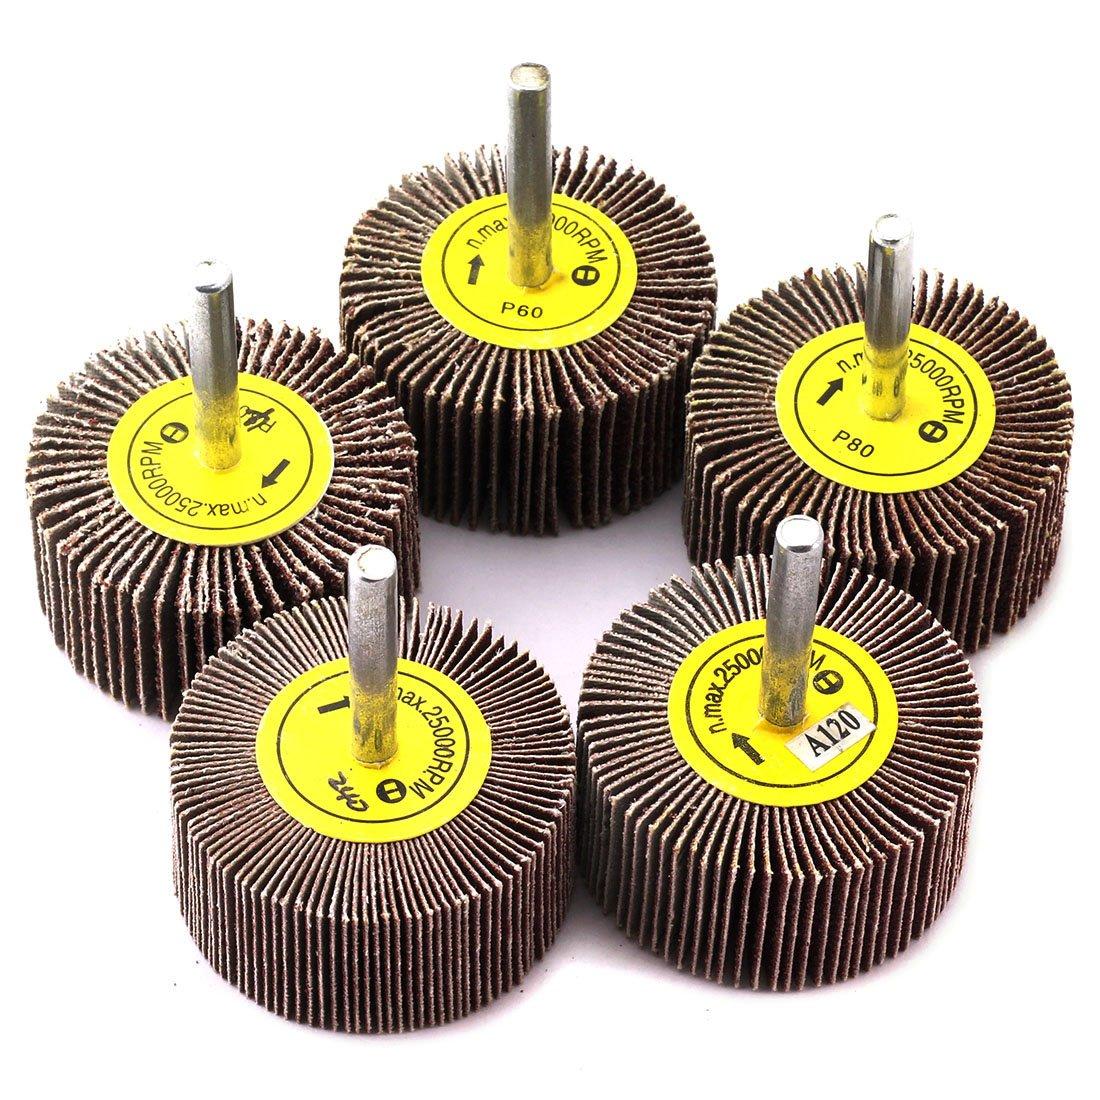 HJ Garden 5pcs 2x1 Inch Sanding Flap Wheels Kit 40/60/80/120/240 Grit Grinding Polish Wheel 1/4 Inch Shank Polishing Abrasive Mounted Flap Wheels